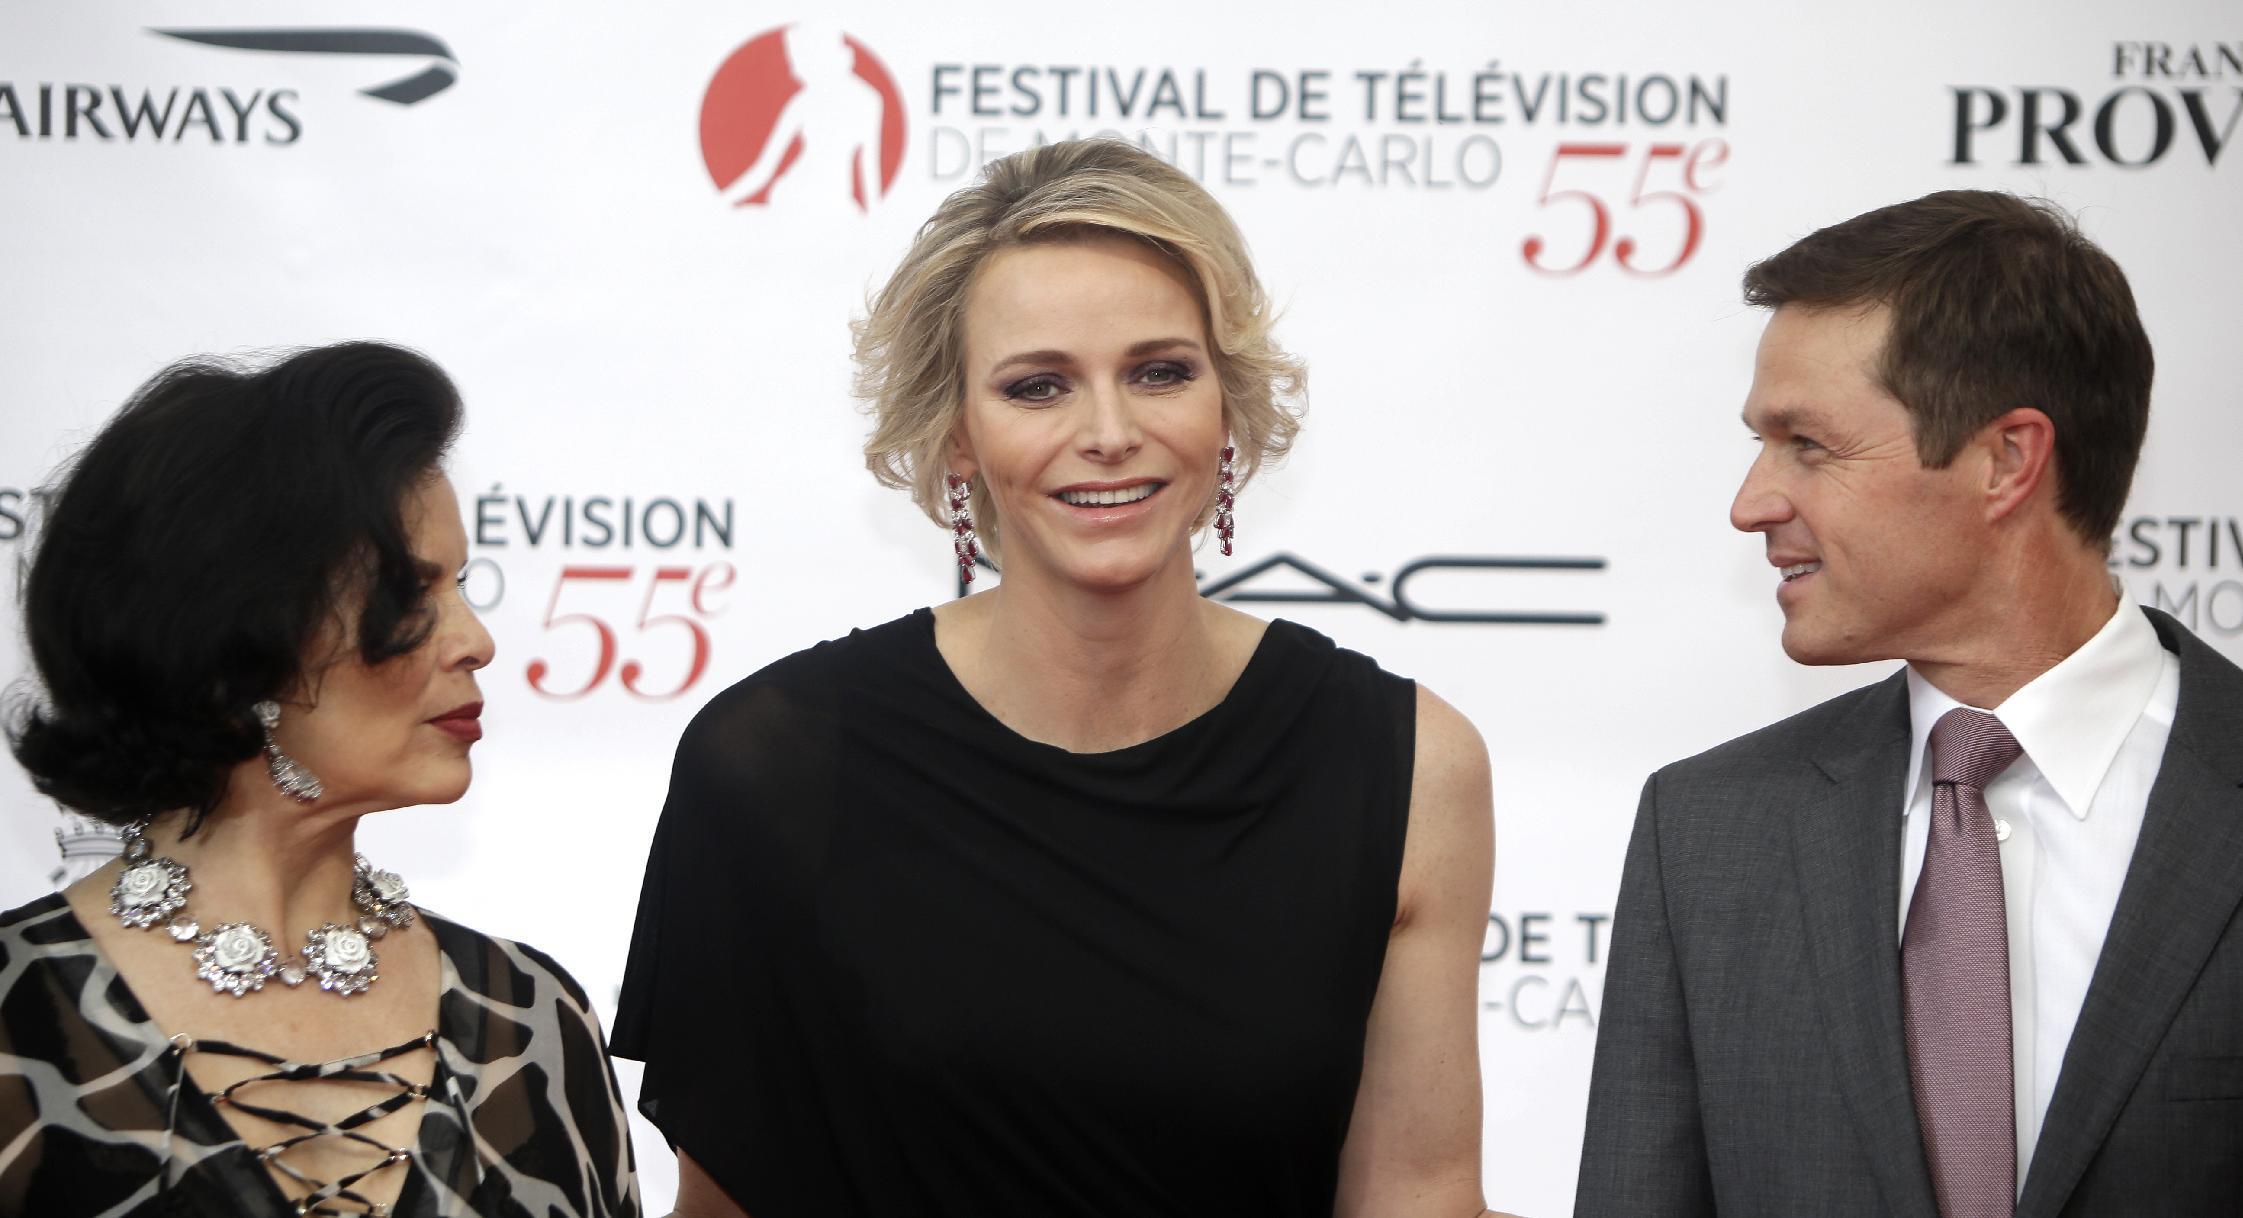 Alberto II y Charlene, Príncipes de Mónaco - Página 7 Ff376f216870491a790f6a706700106b